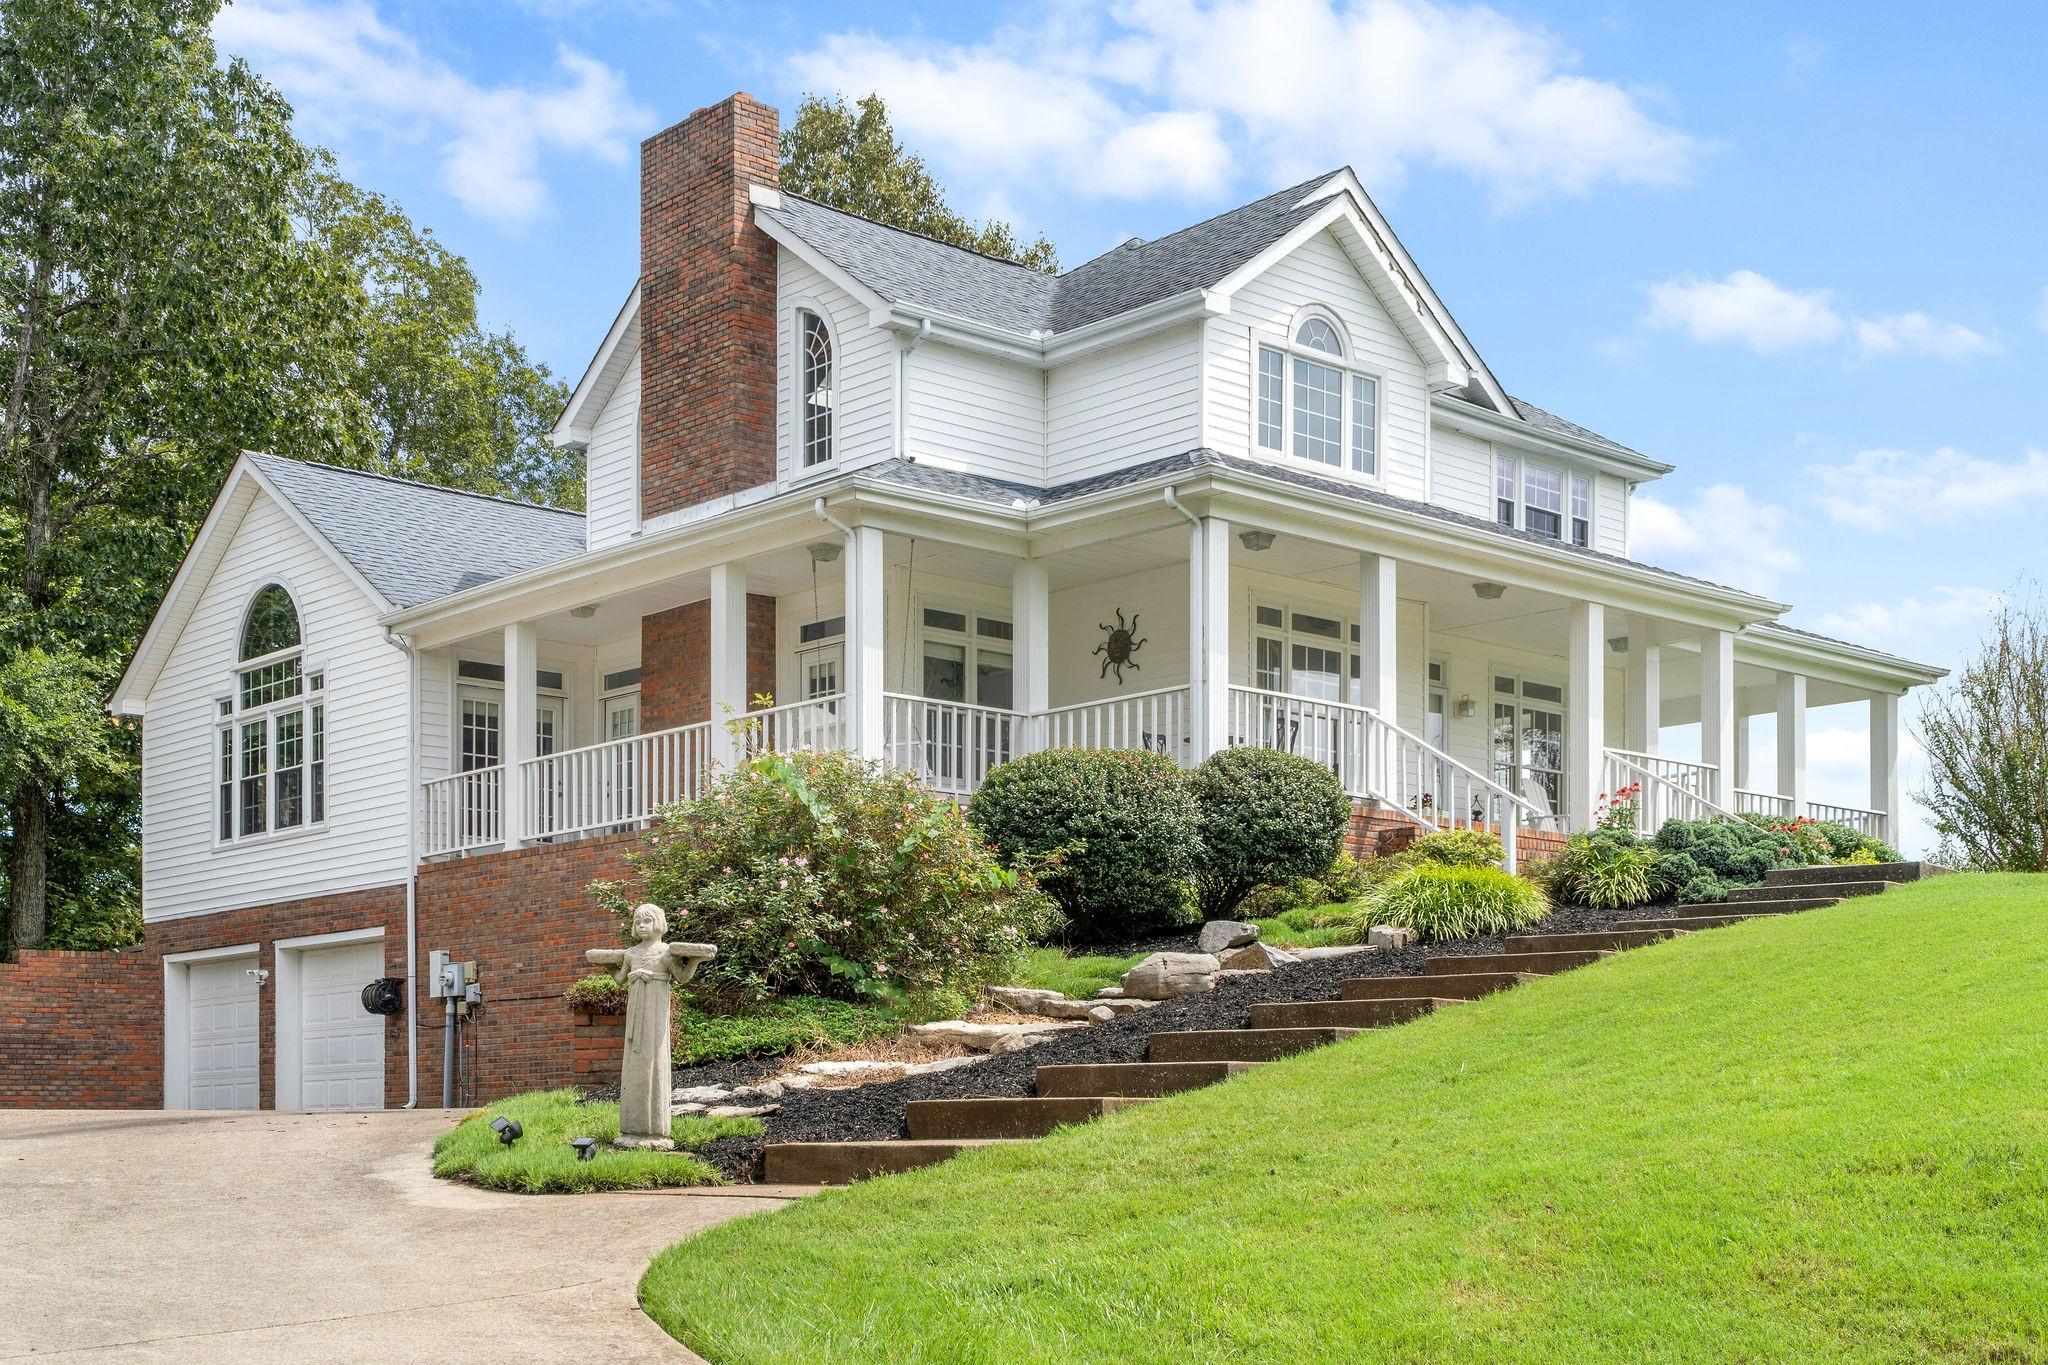 1737 Riverhaven Dr Property Photo - Adams, TN real estate listing